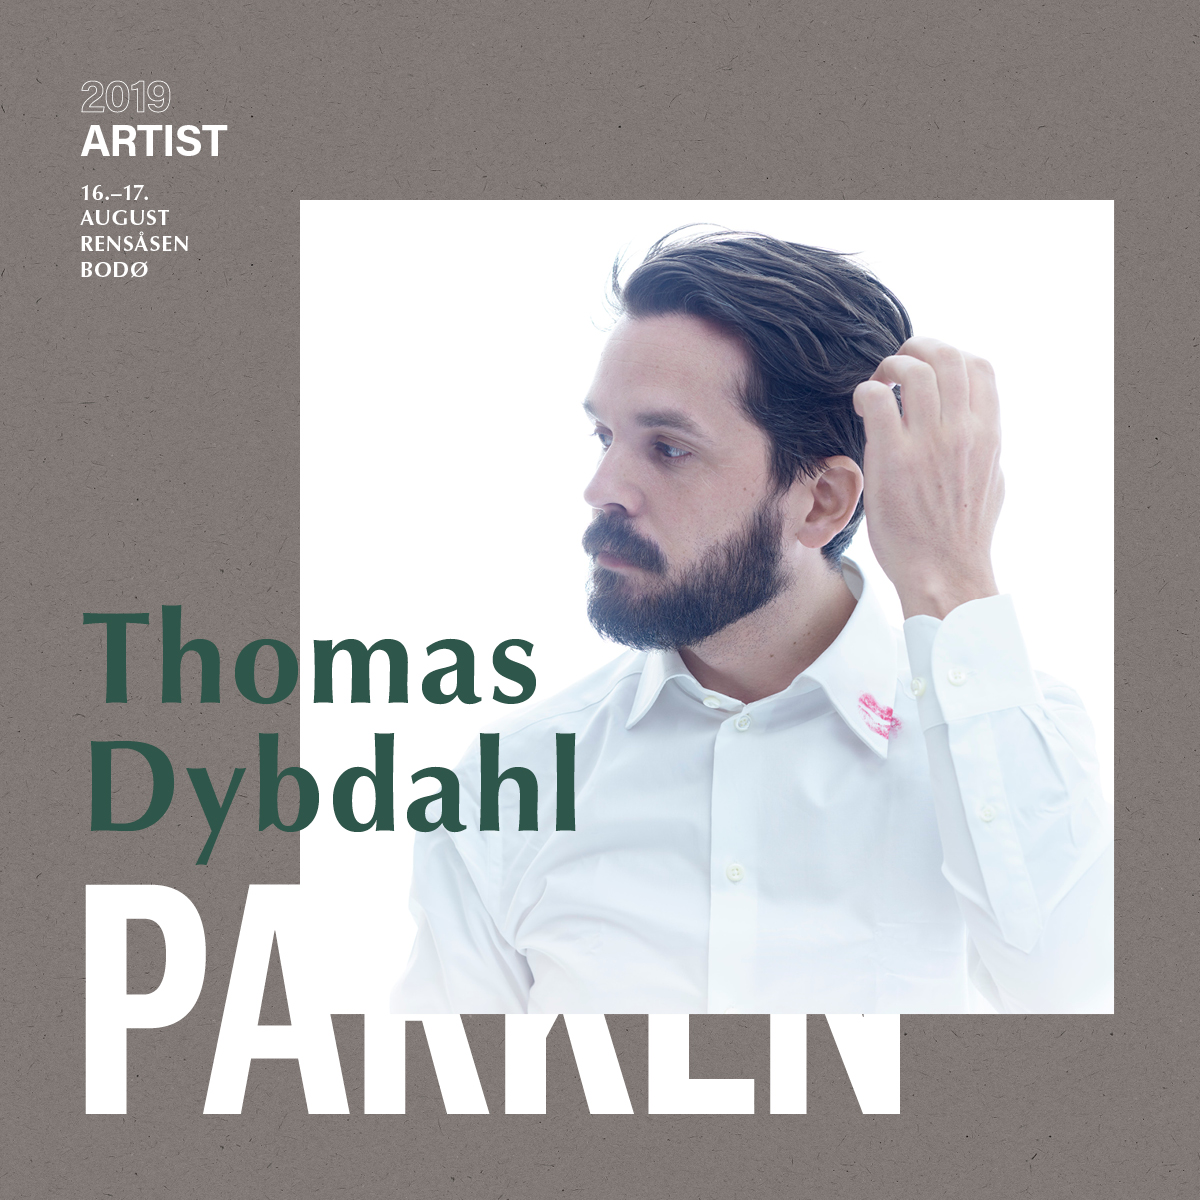 BYRAA_Parken_2019_Artistslipp_Thomas_Dybdahl_1200x1200px.jpg